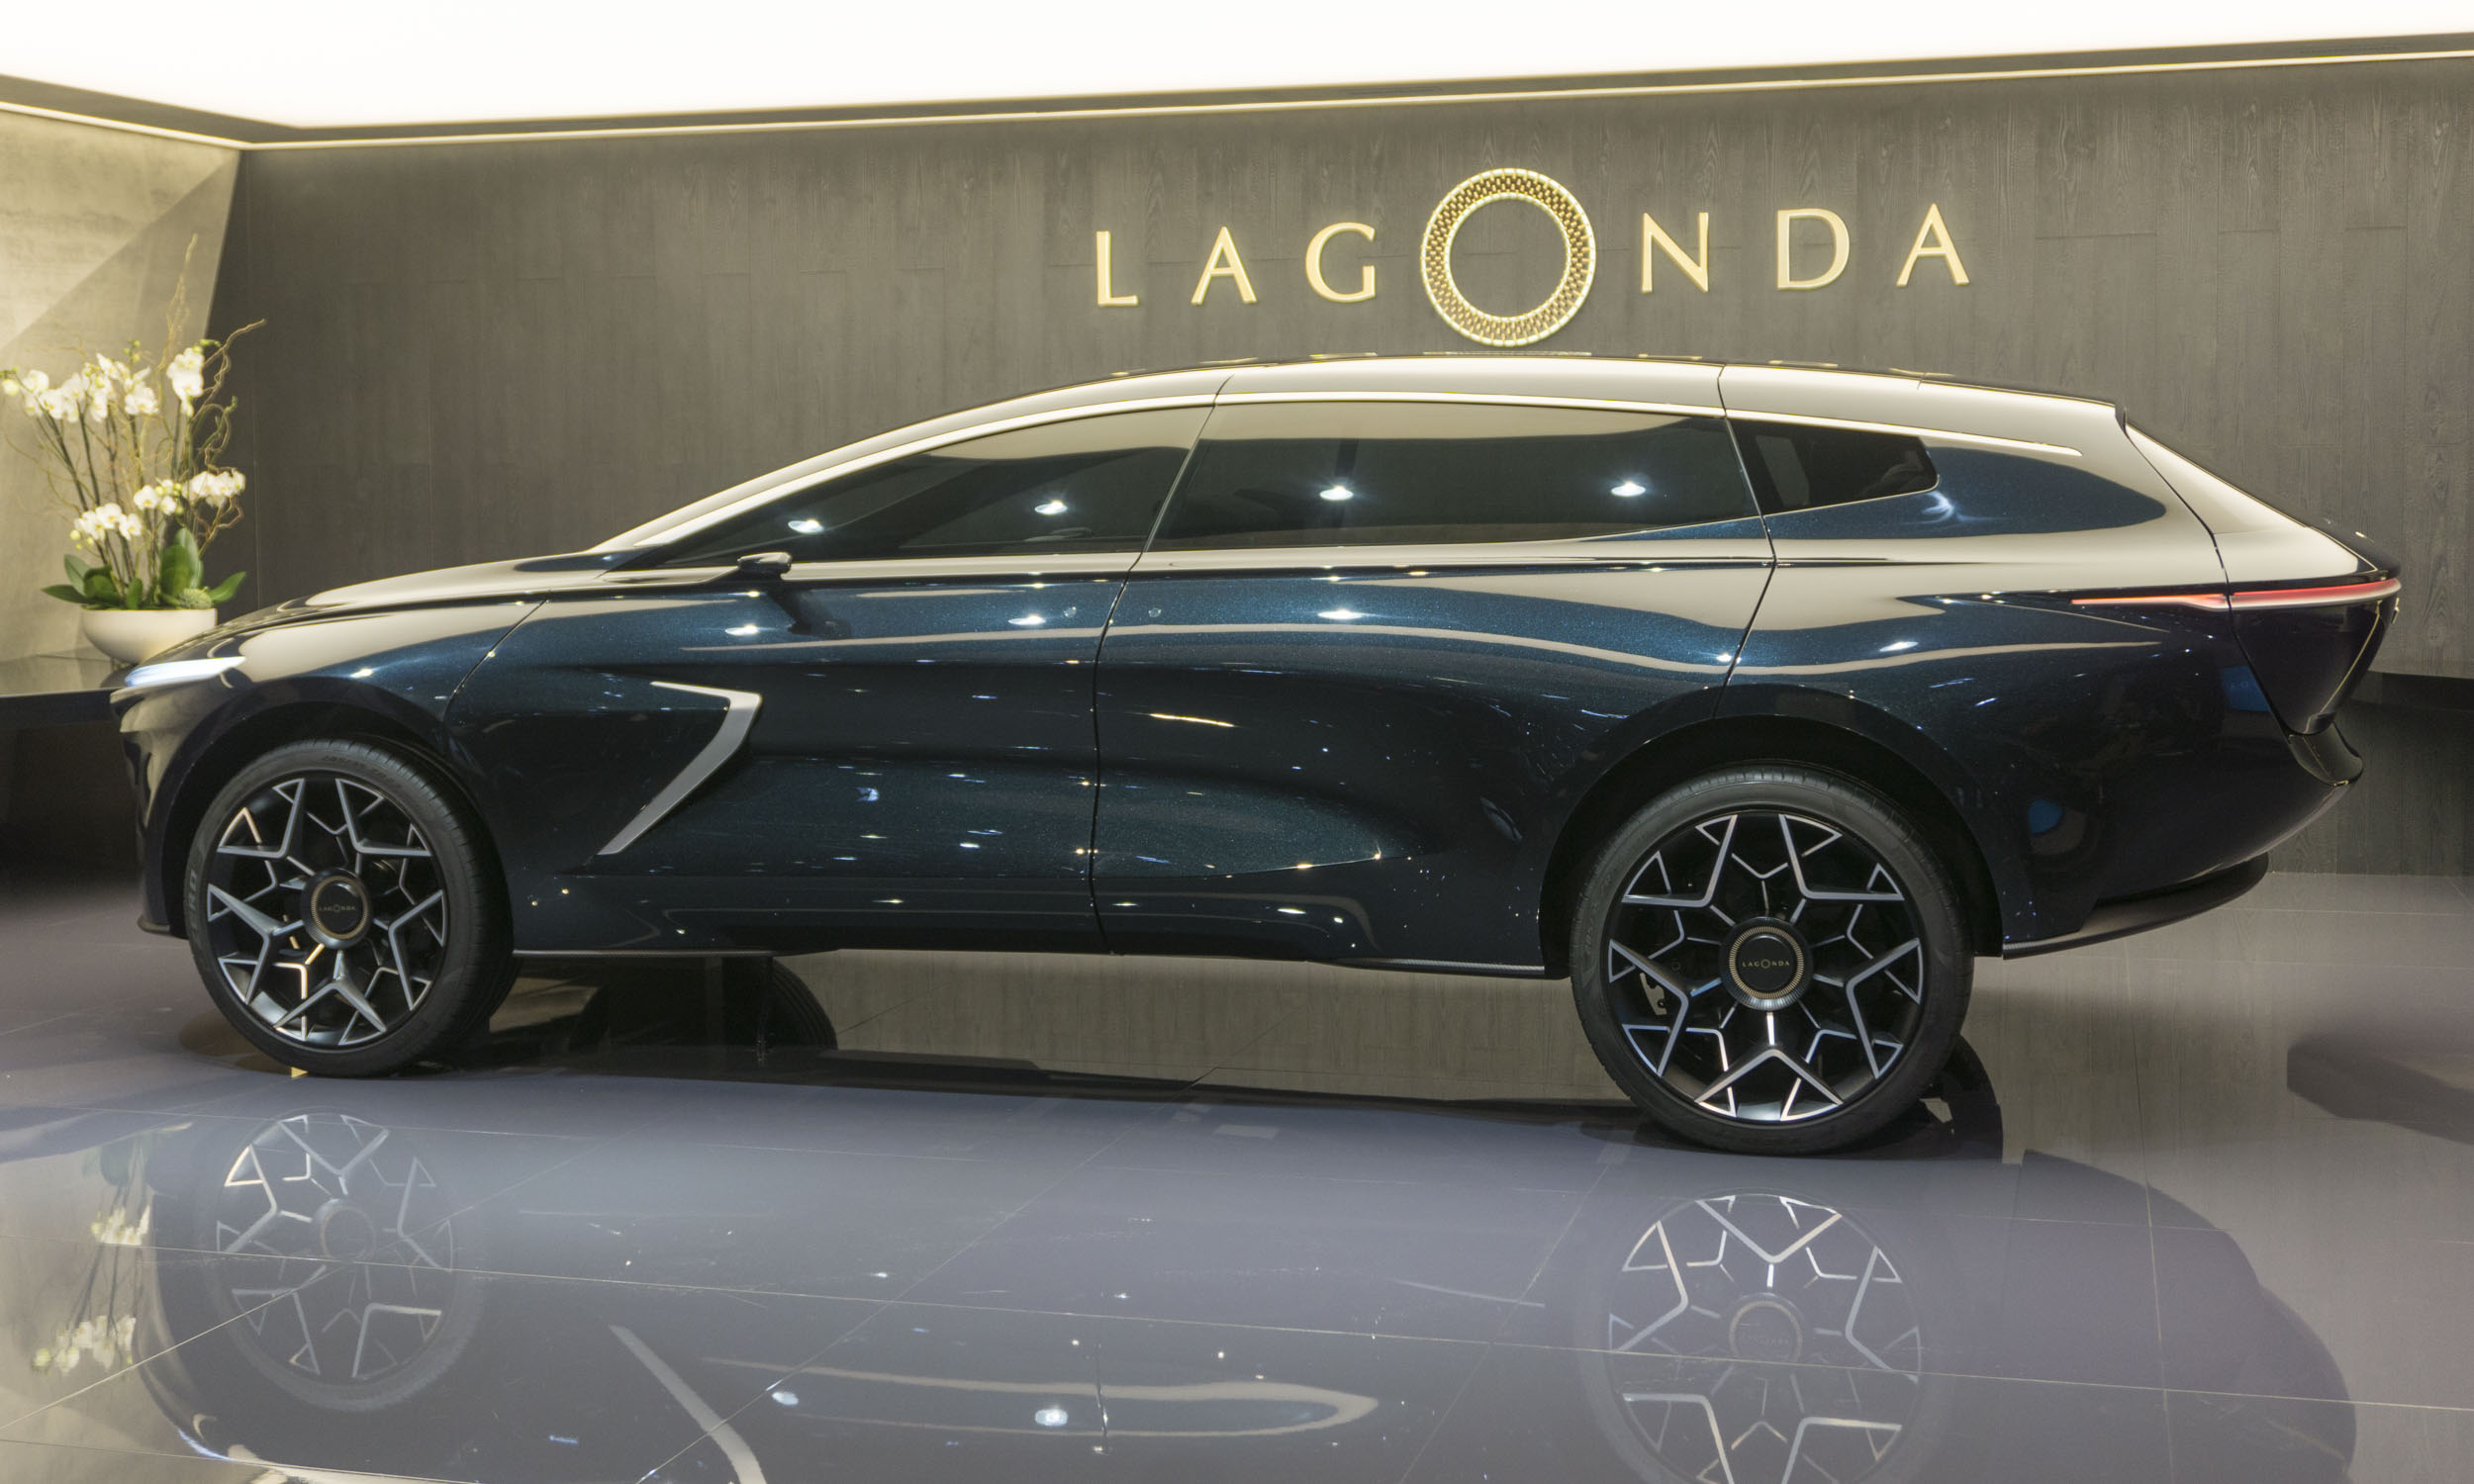 2019 Geneva Motor Show: Aston Martin Lagonda All-Terrain Concept